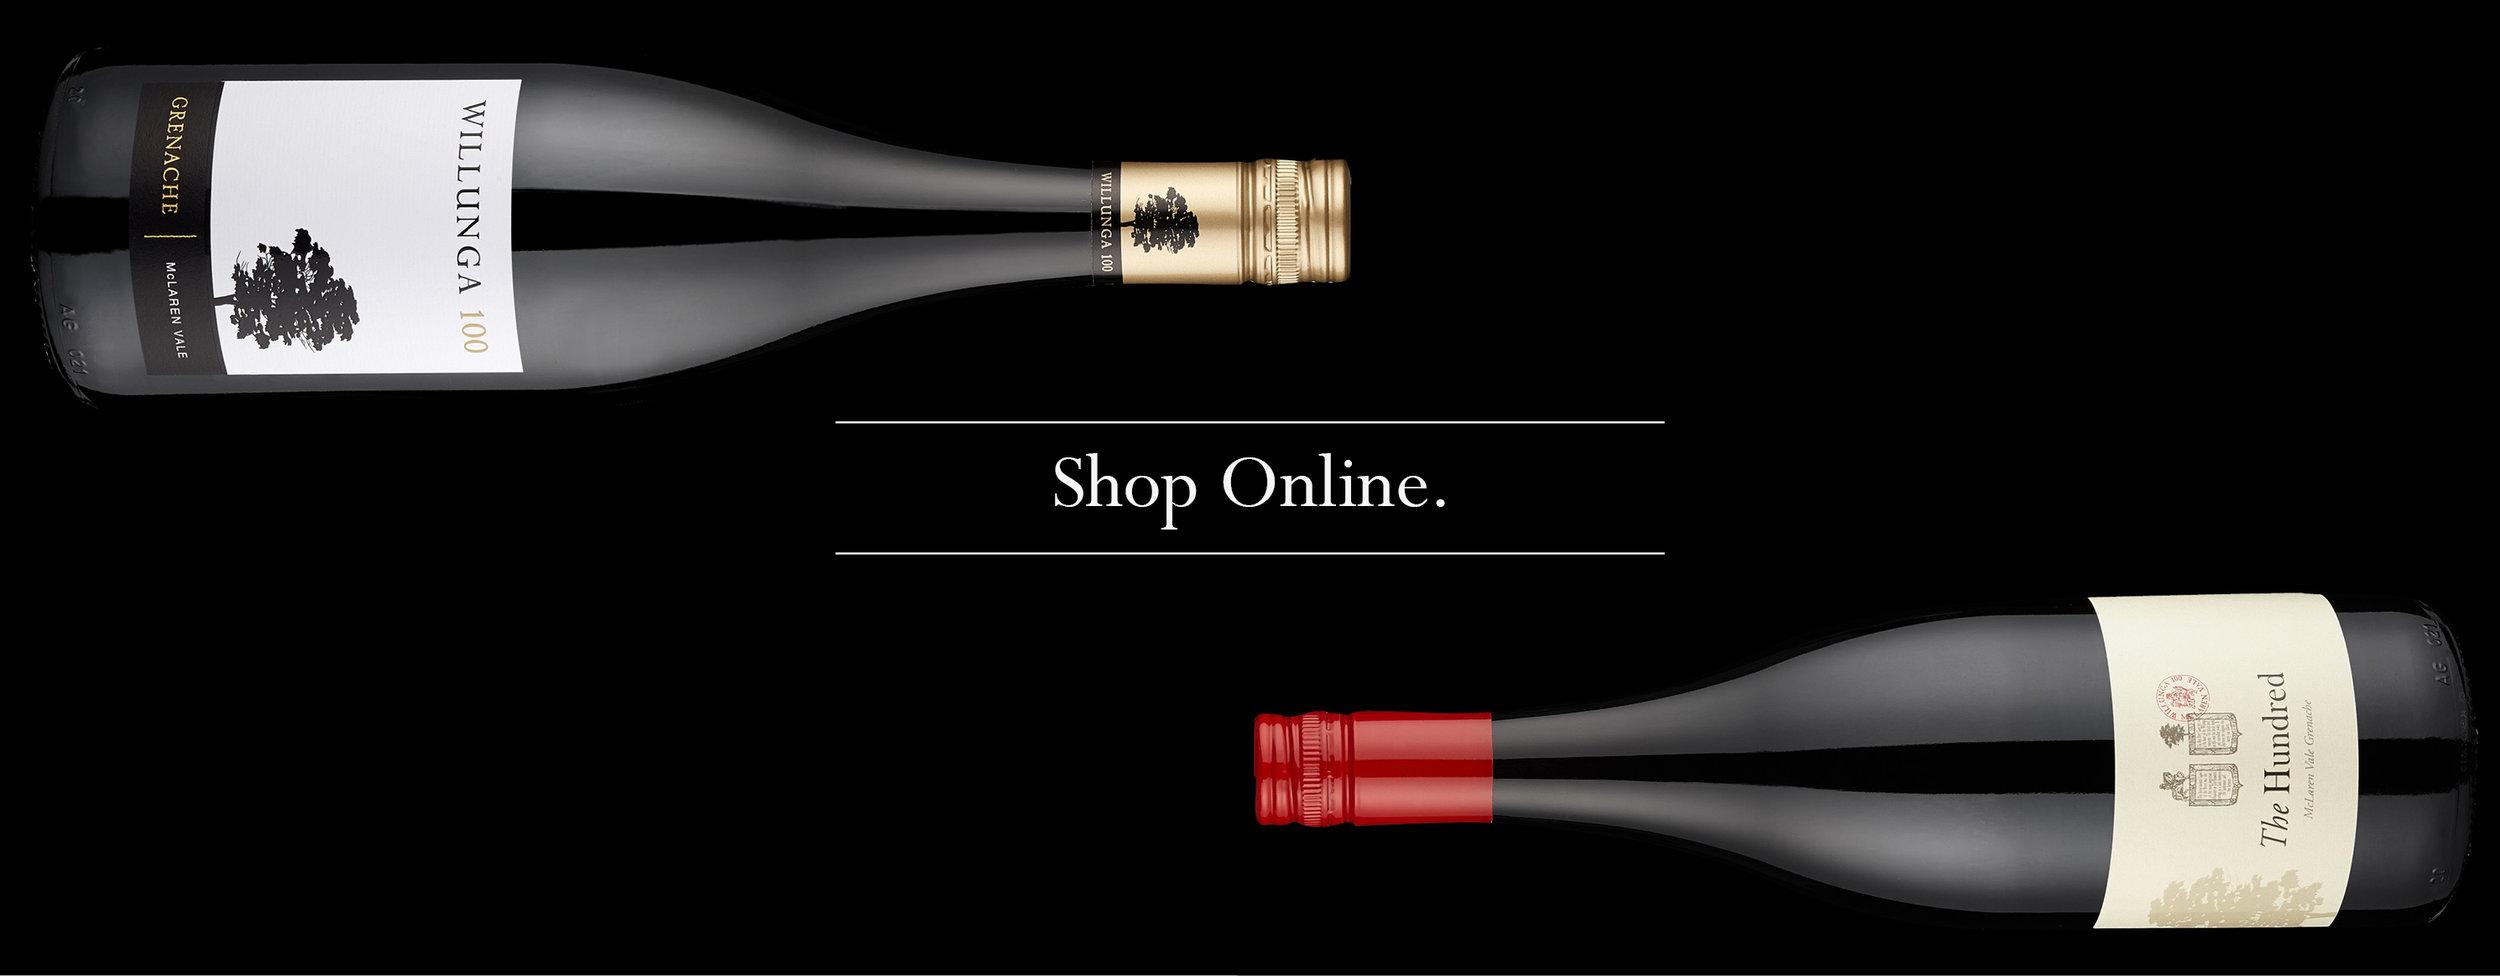 Banner Homepage, Squarespace Shop online.jpg